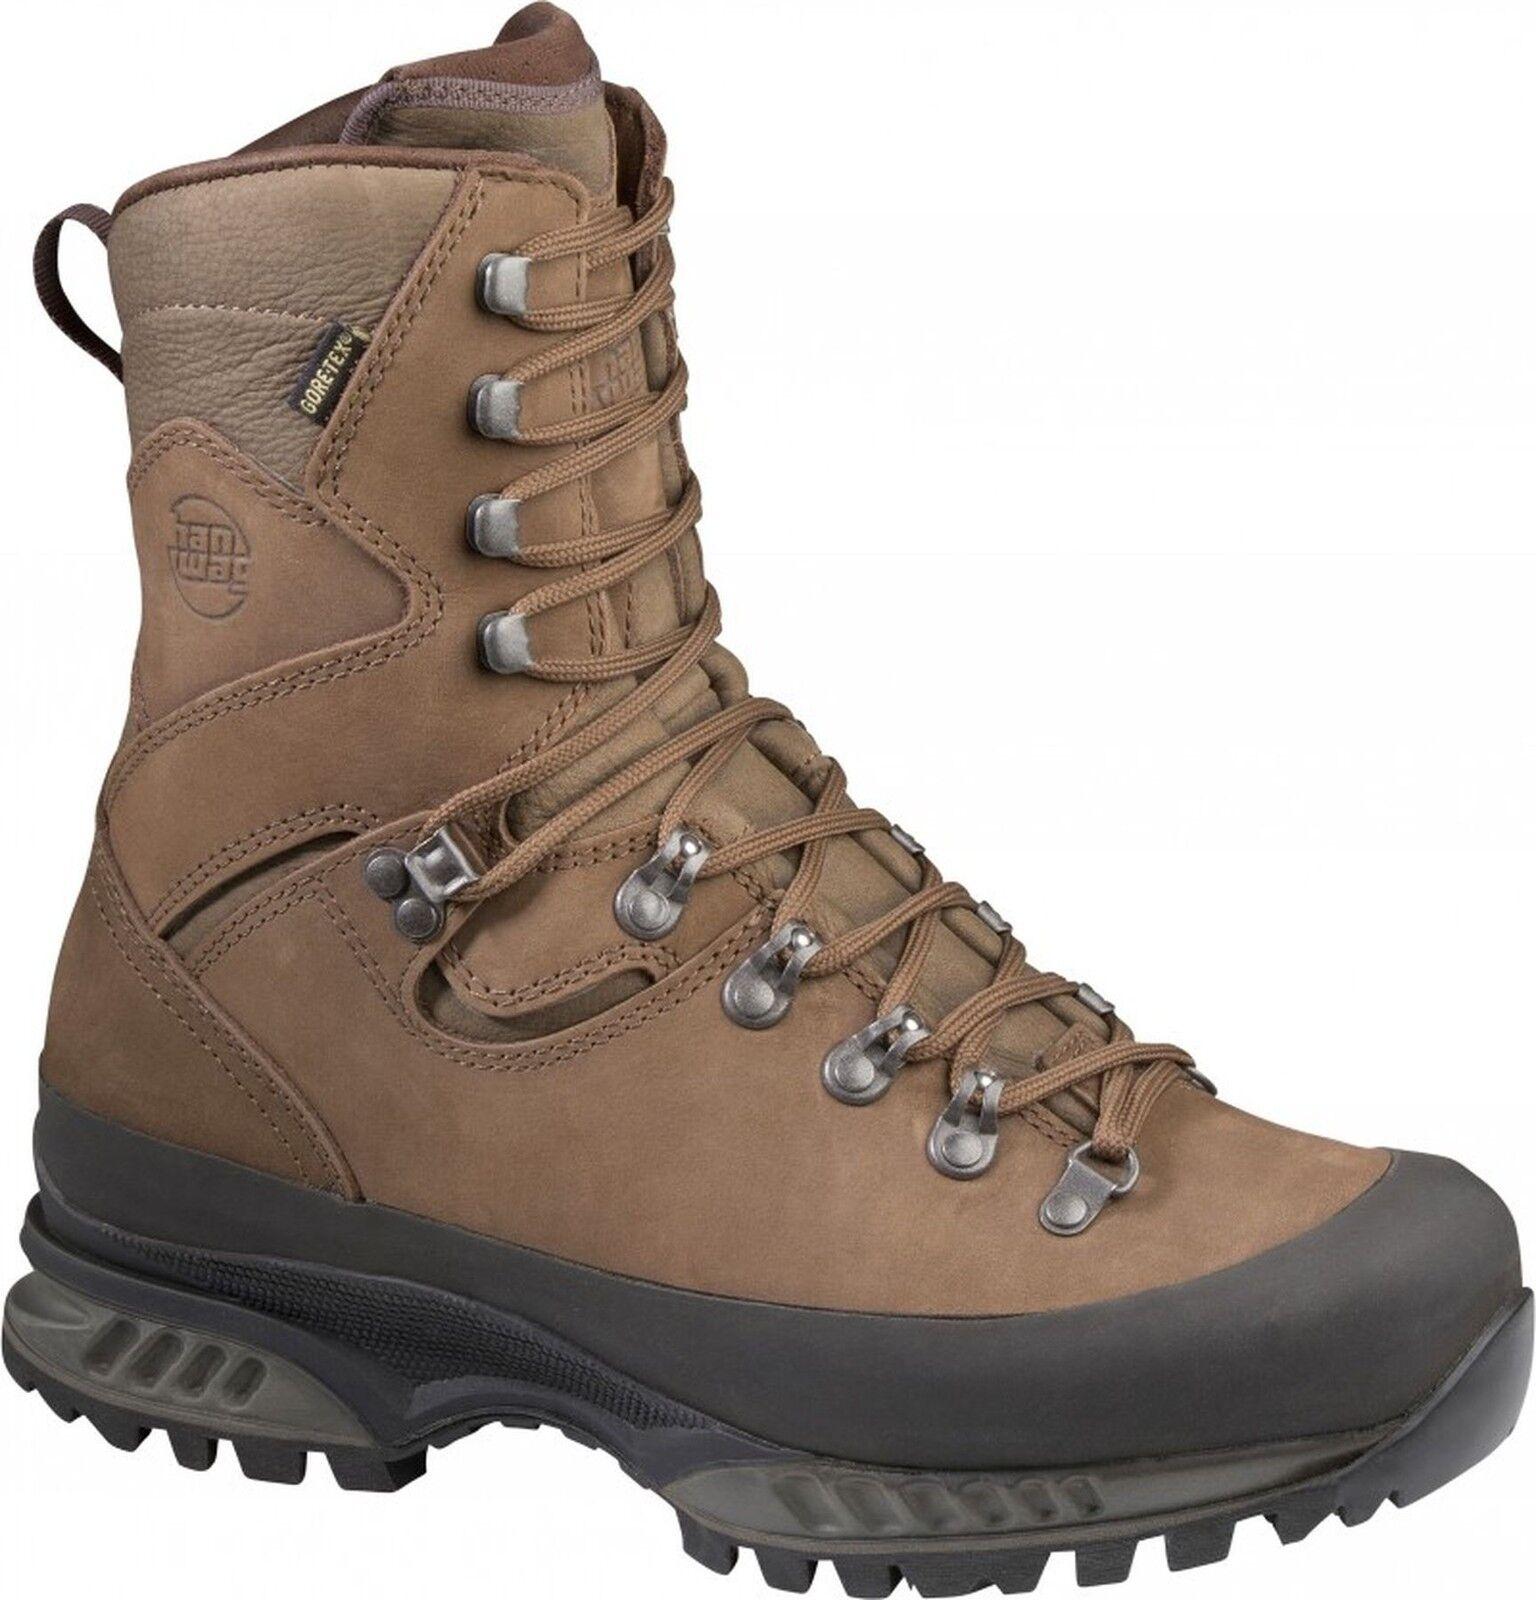 Hanwag Mountain schoenen  Tatra Top Breed Gore-Tex afmeting 8,5 --42,5 Earth